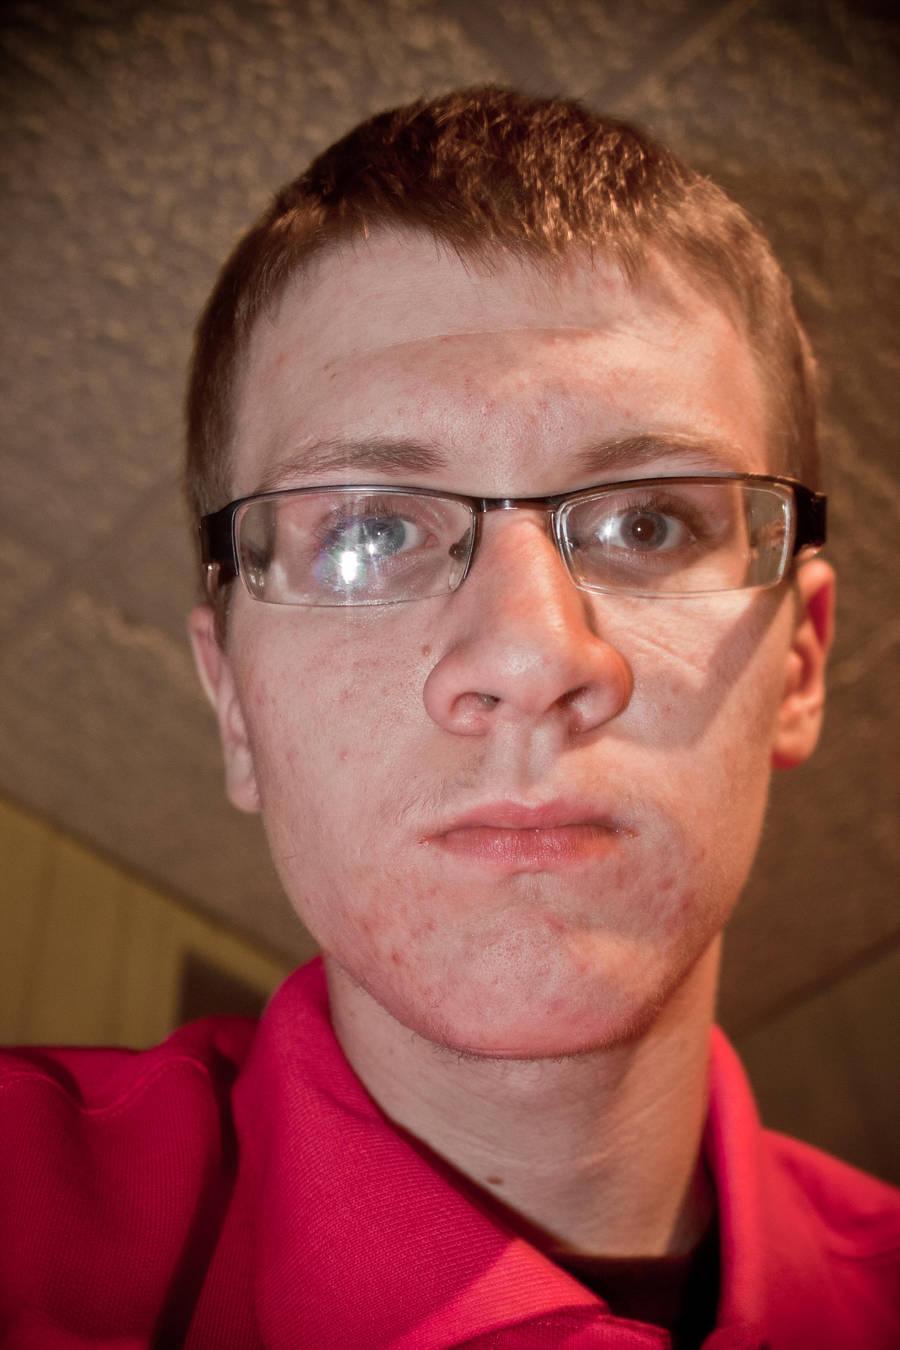 JamesBensonArt's Profile Picture